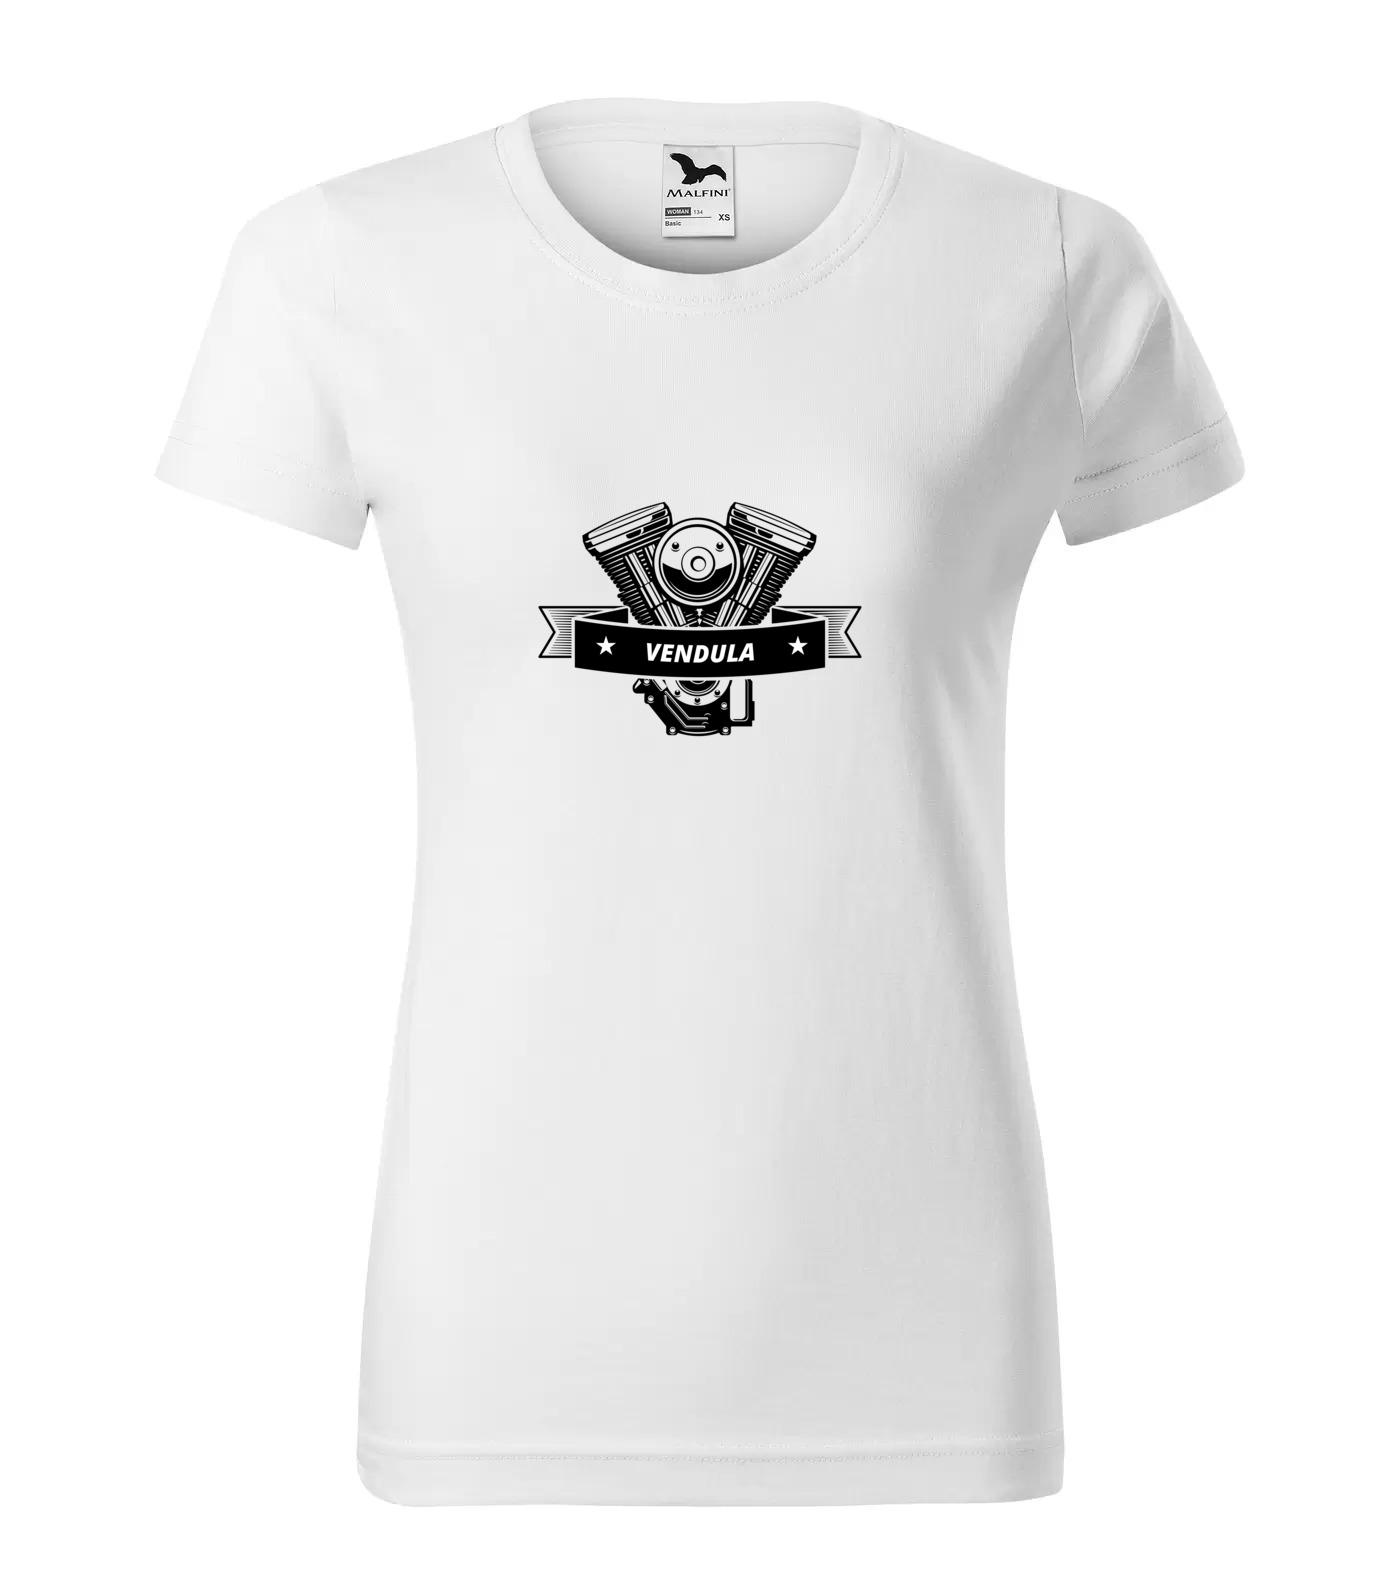 Tričko Motorkářka Vendula